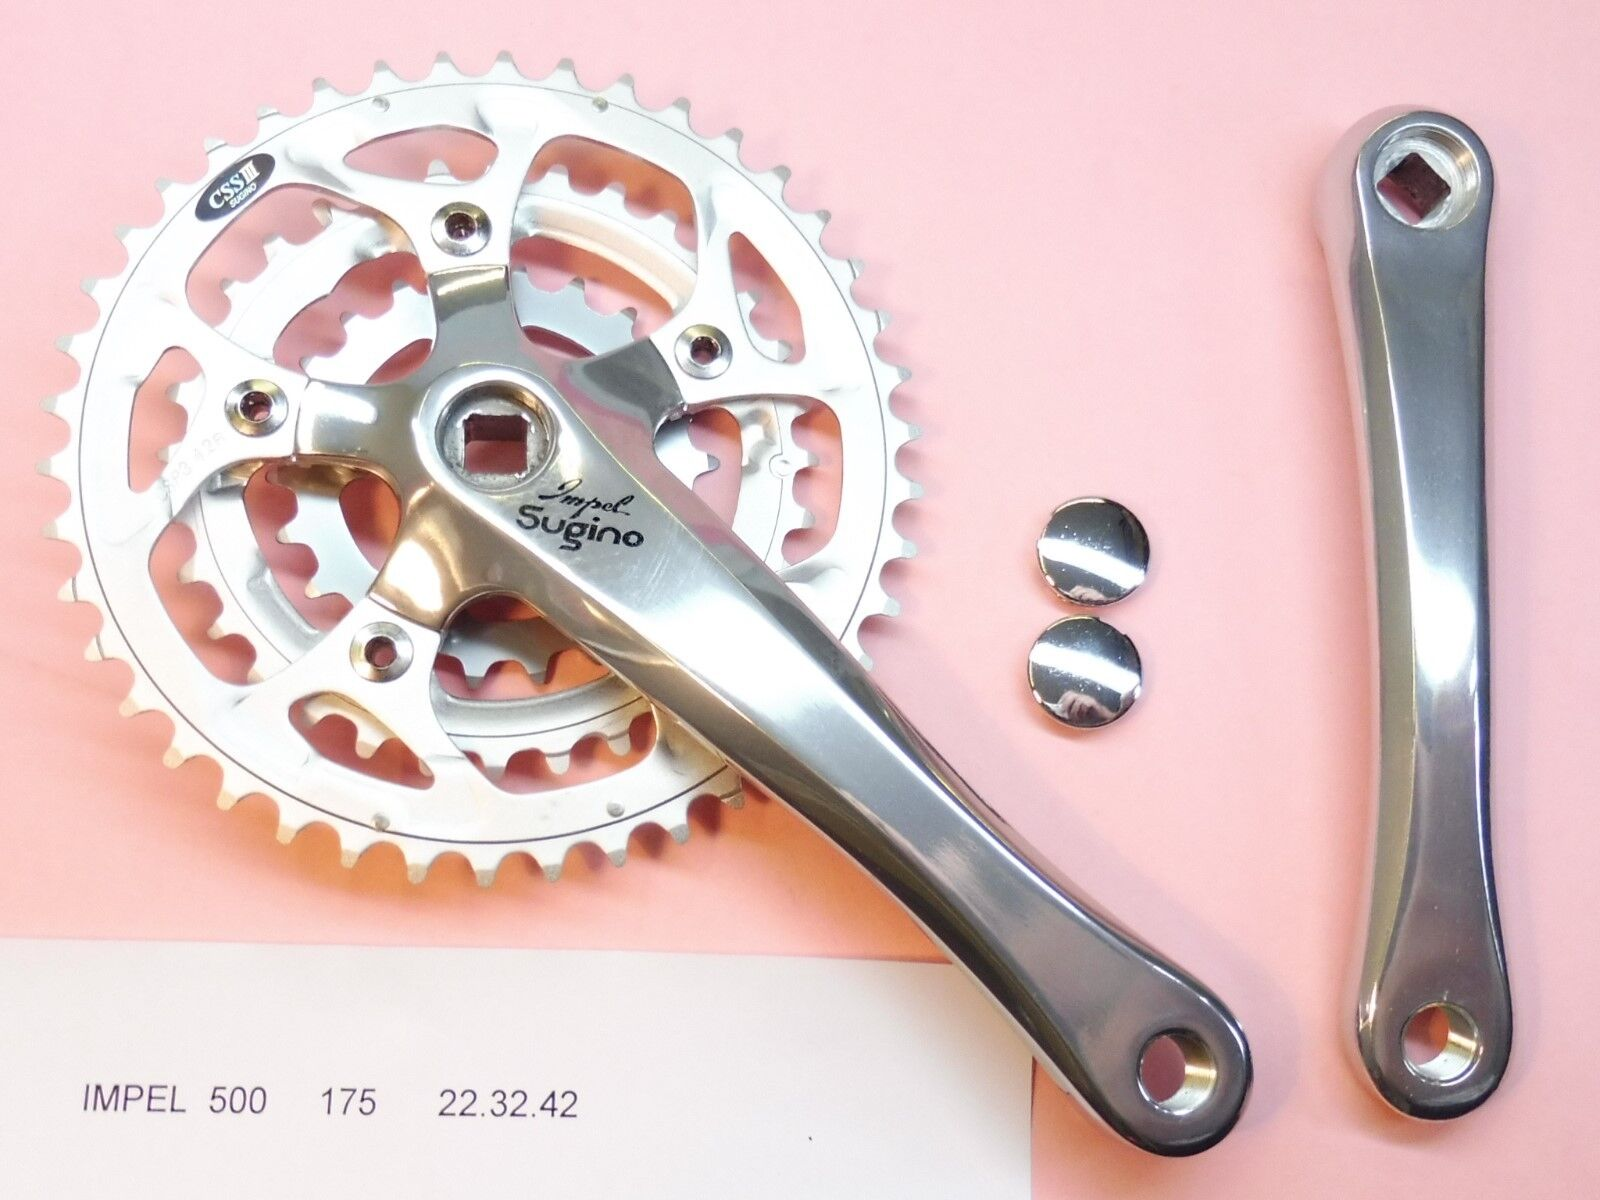 Sugino Impel 500 pedaliera in bicicletta bicicletta bicicletta - 175mm 22x32x42 pedaliera in nn. bab1a7